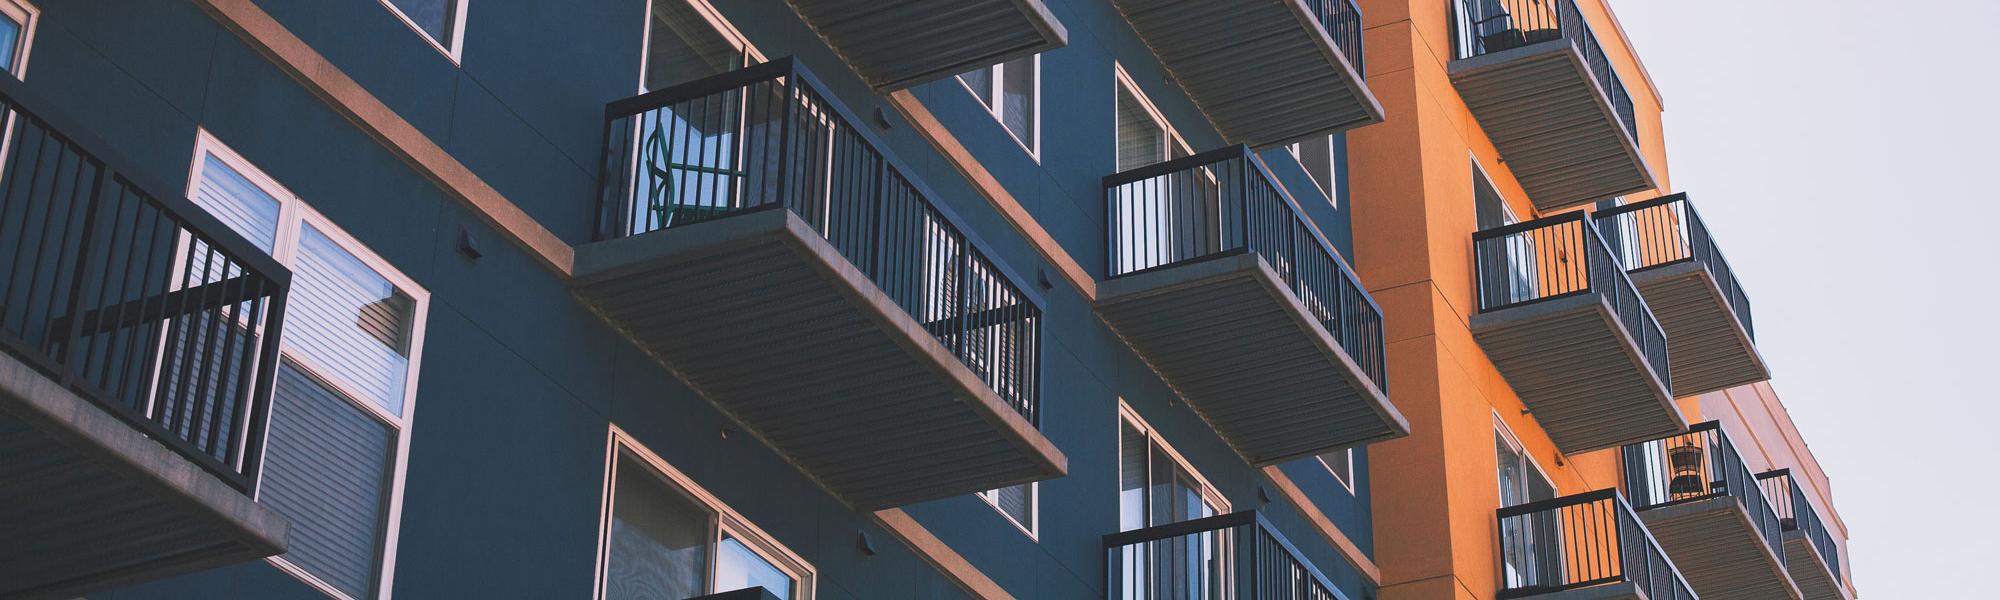 Apartments Photo by Brandon Griggs on Unsplash